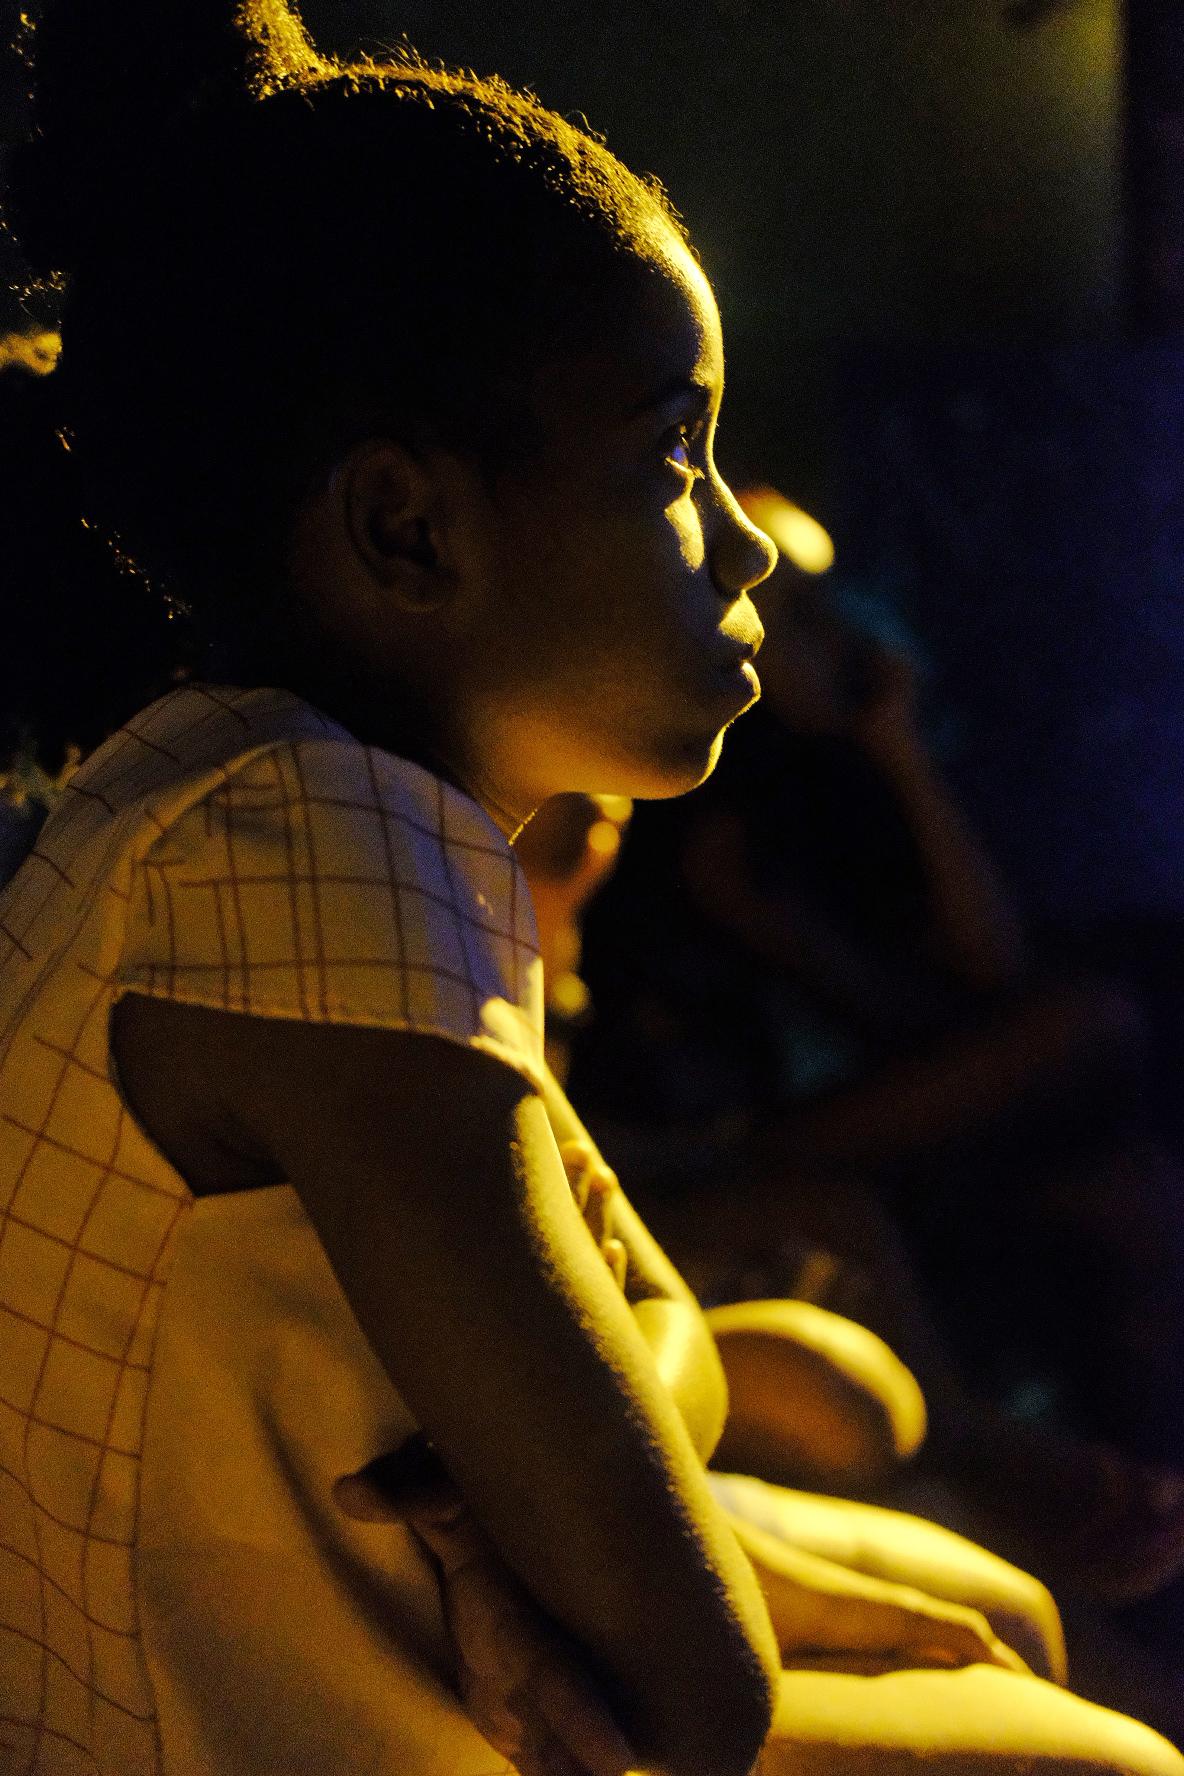 ETIV do Brasil - NGO - Volunteering - Brazil - South America